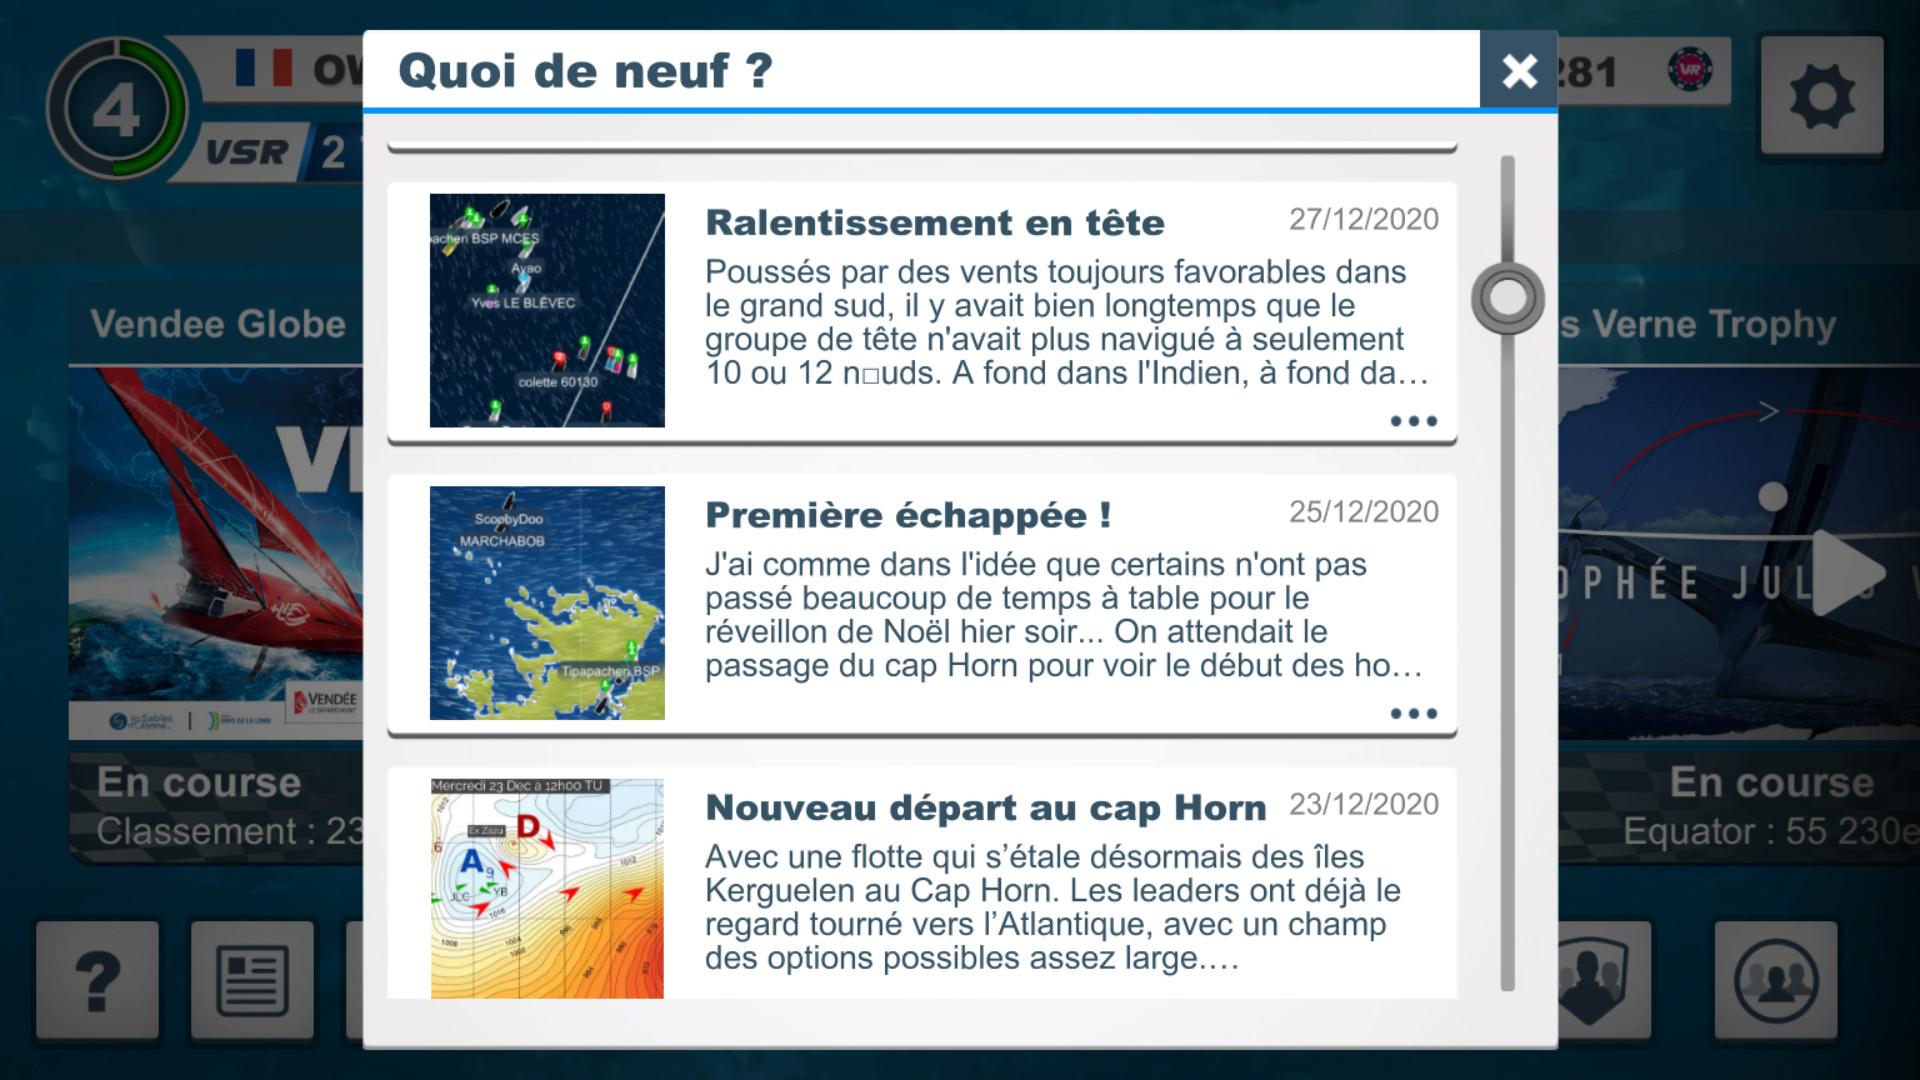 Vendée Globe virtuel: Virtual Regatta, édition 2020 - Page 2 Captur70